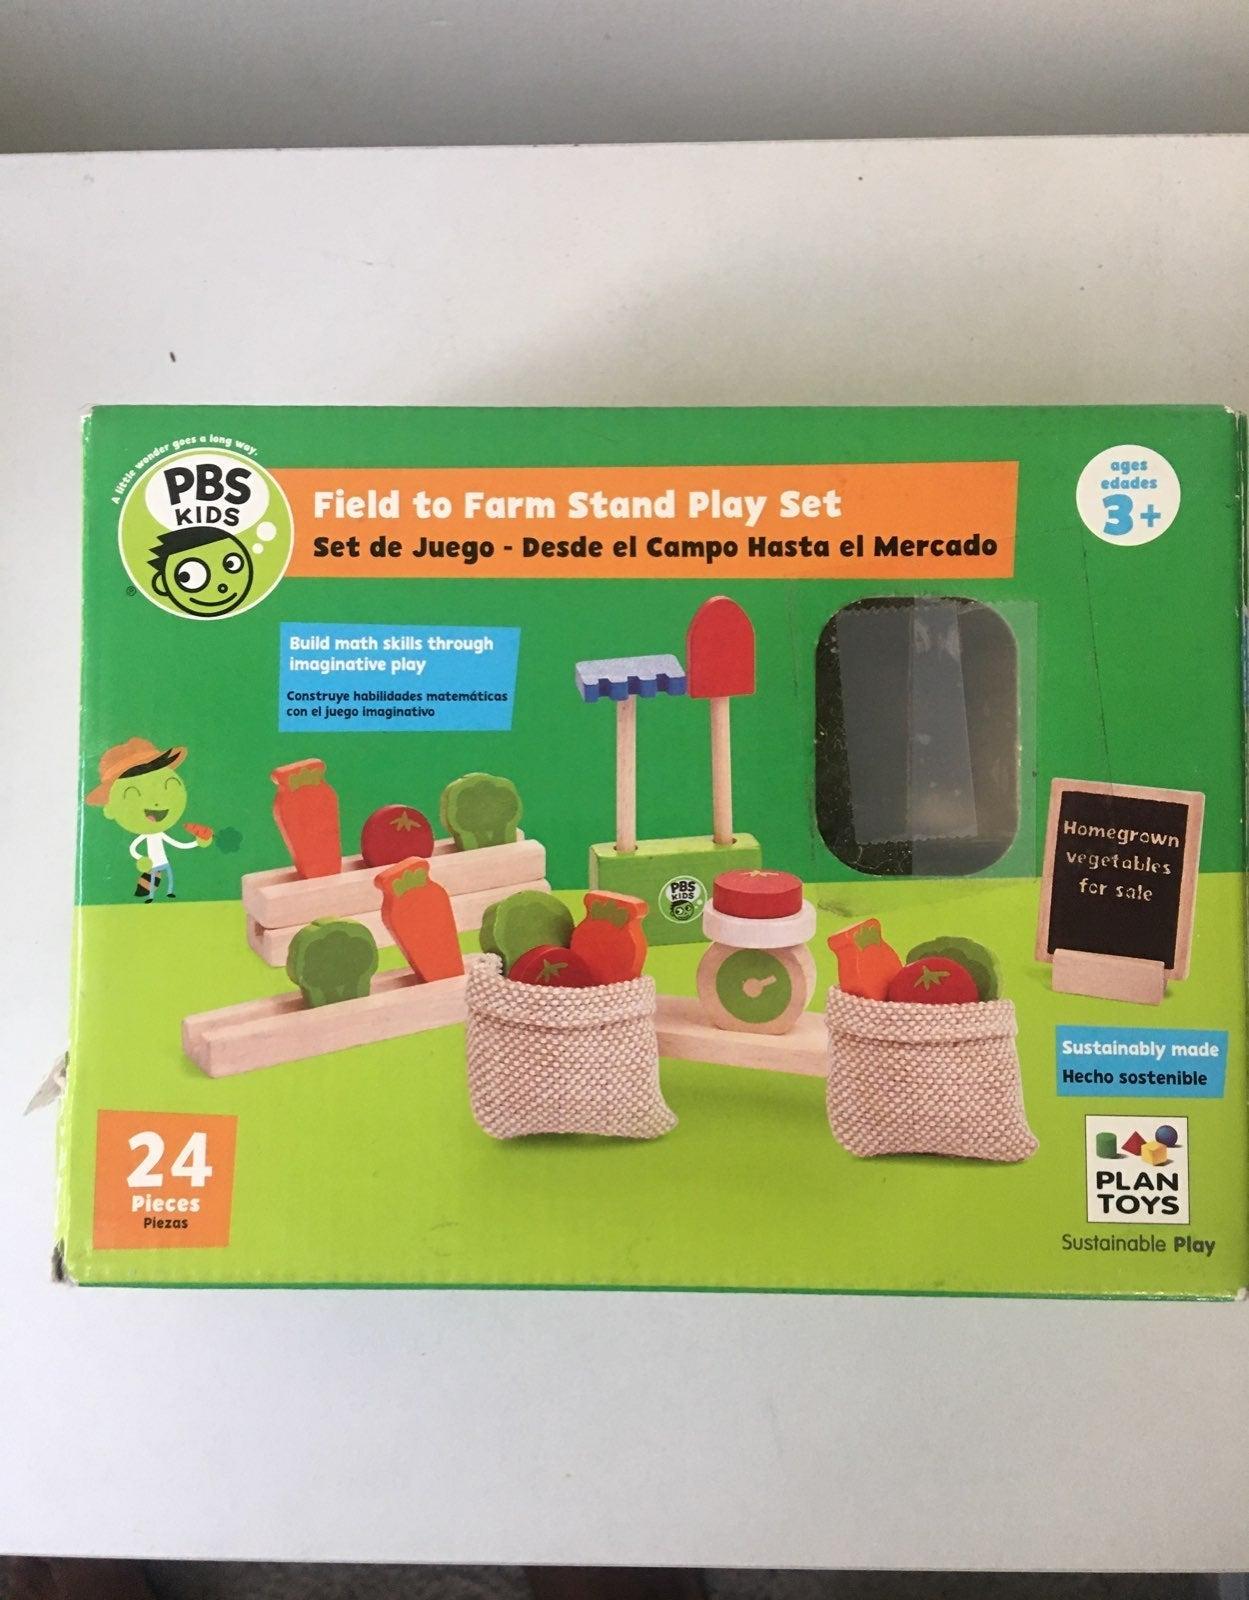 Plan toys pbs kids farm stand play set